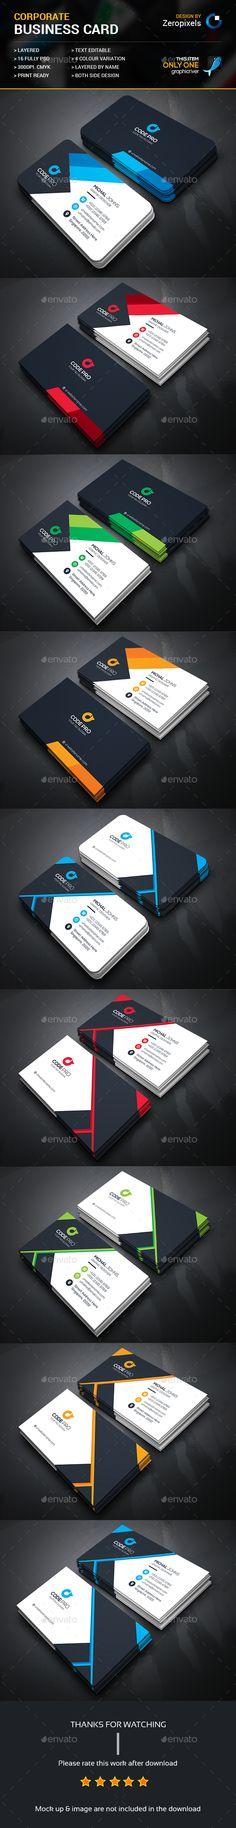 Corporate Business Card Bundle Templates PSD. Download here: http://graphicriver.net/item/corporate-business-card-bundle/16341011?ref=ksioks